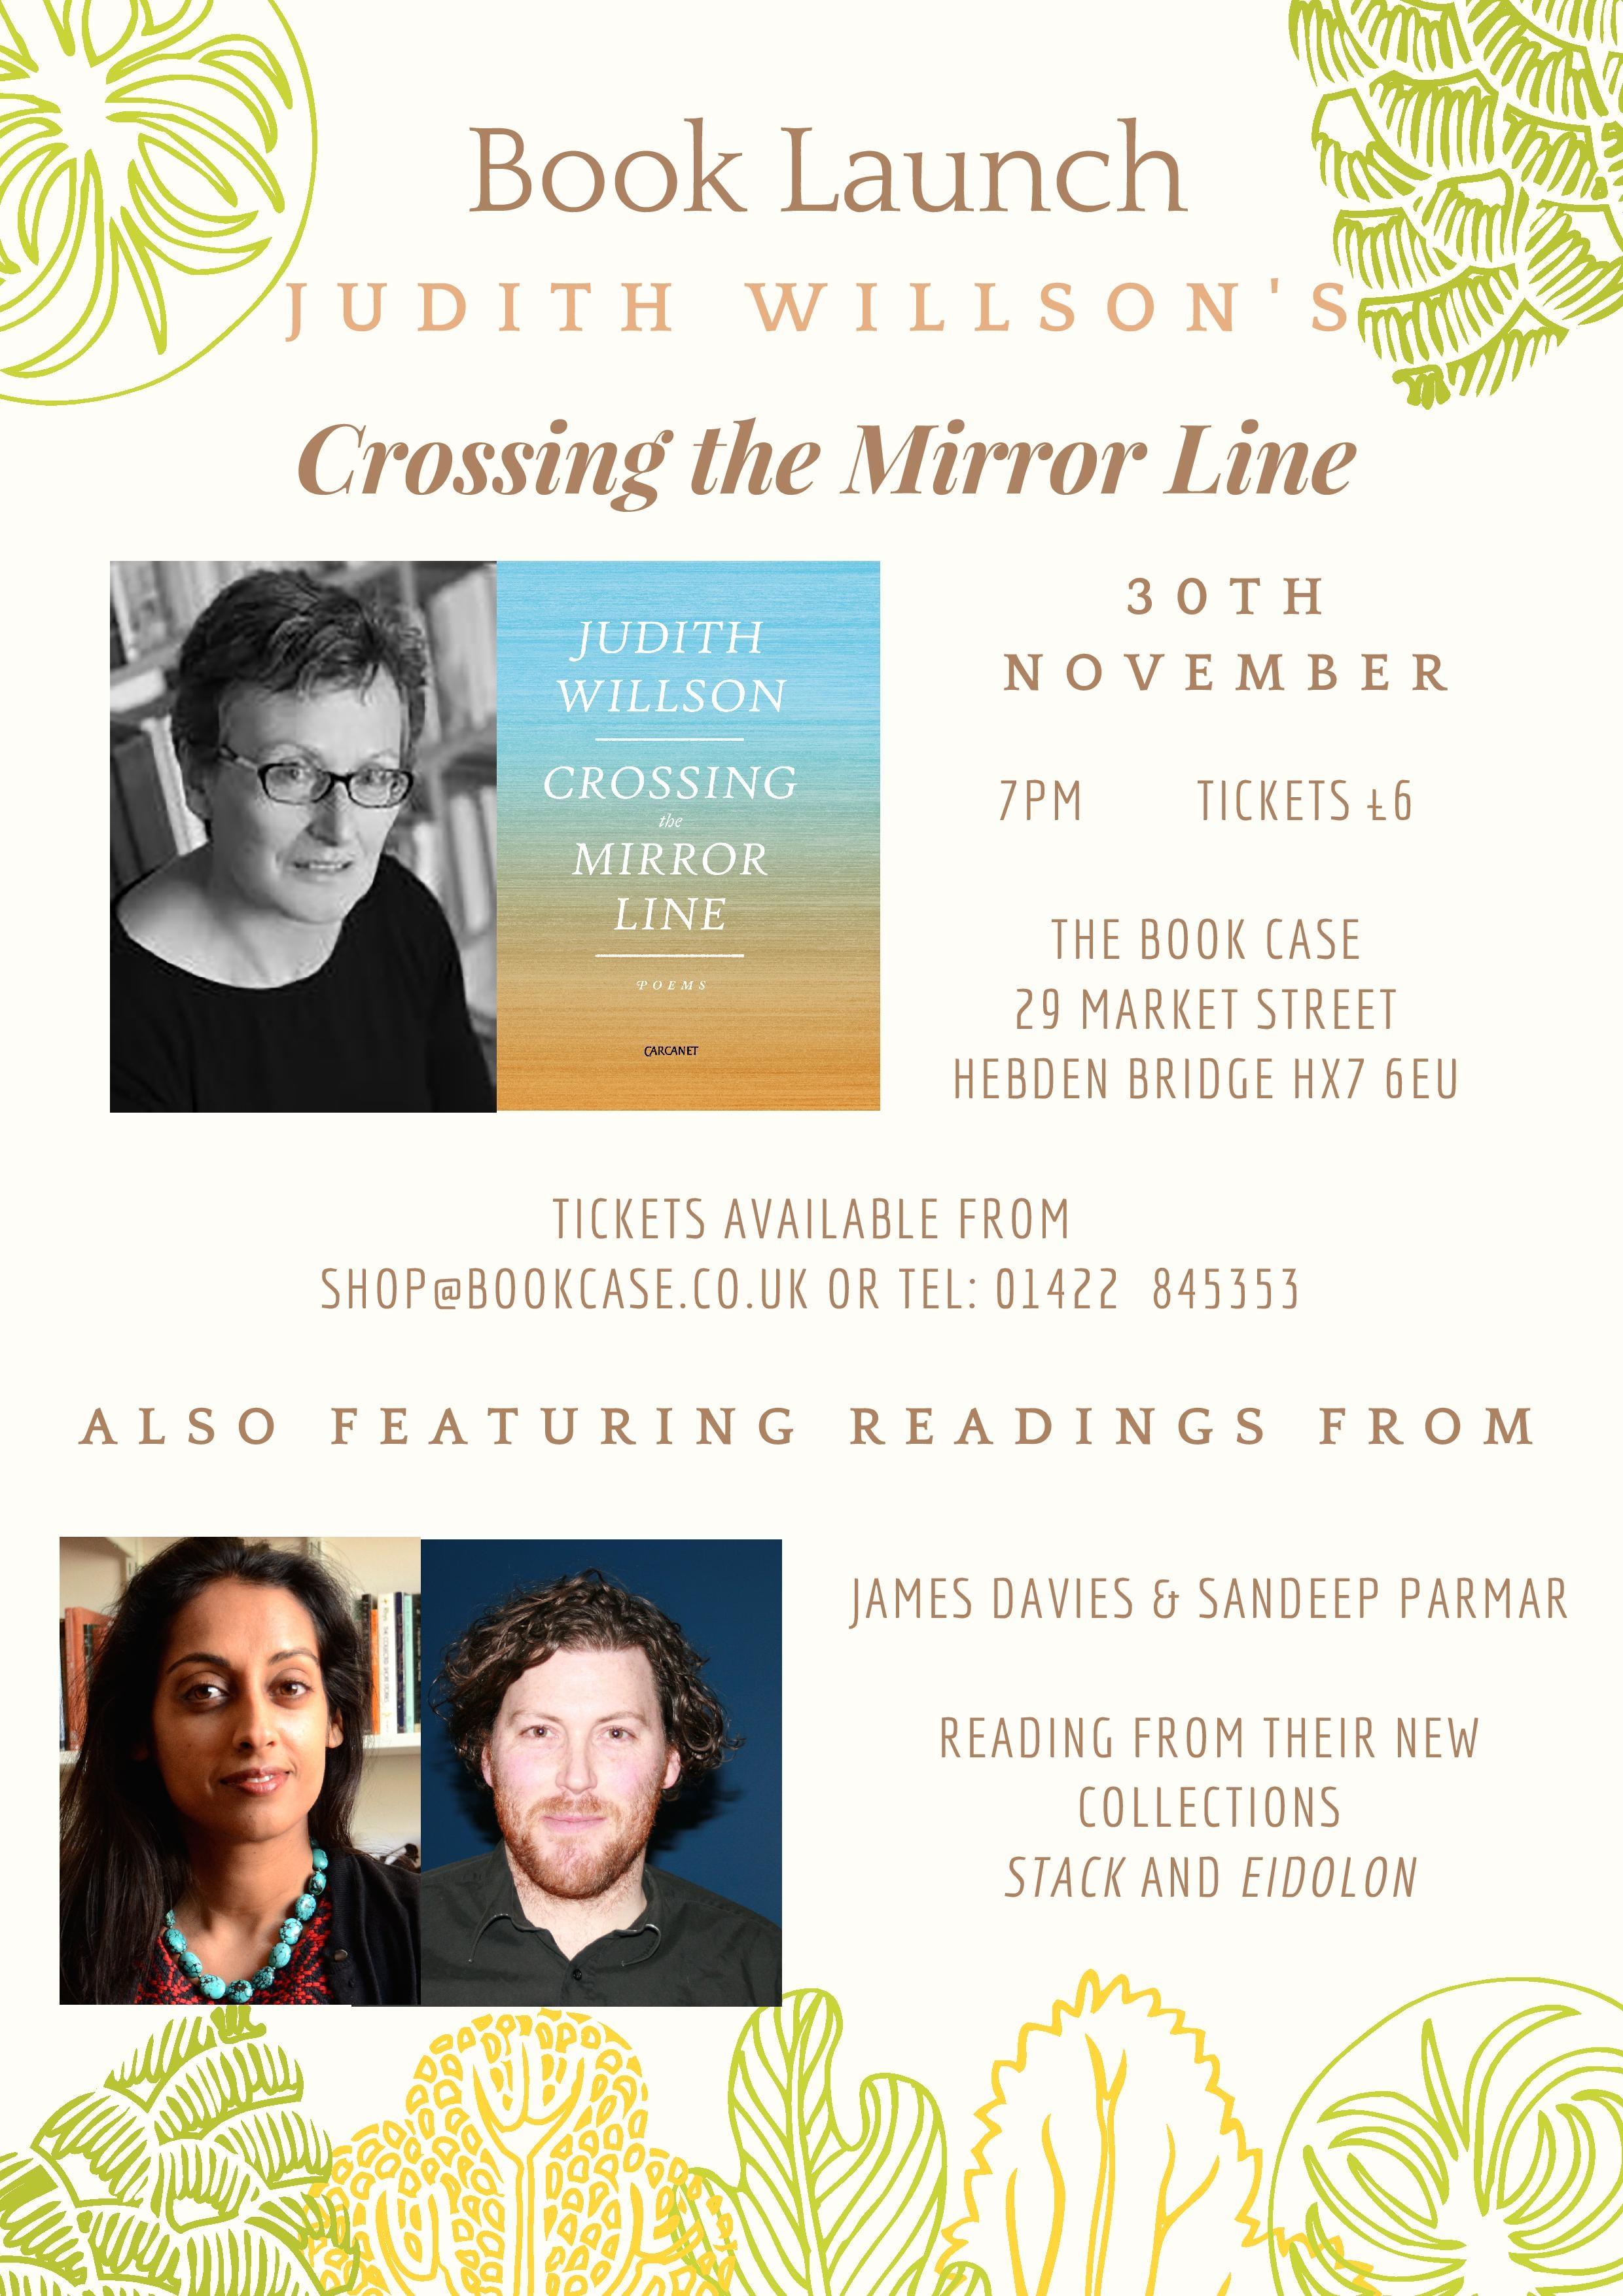 Judith Willson book launch poster.jpg